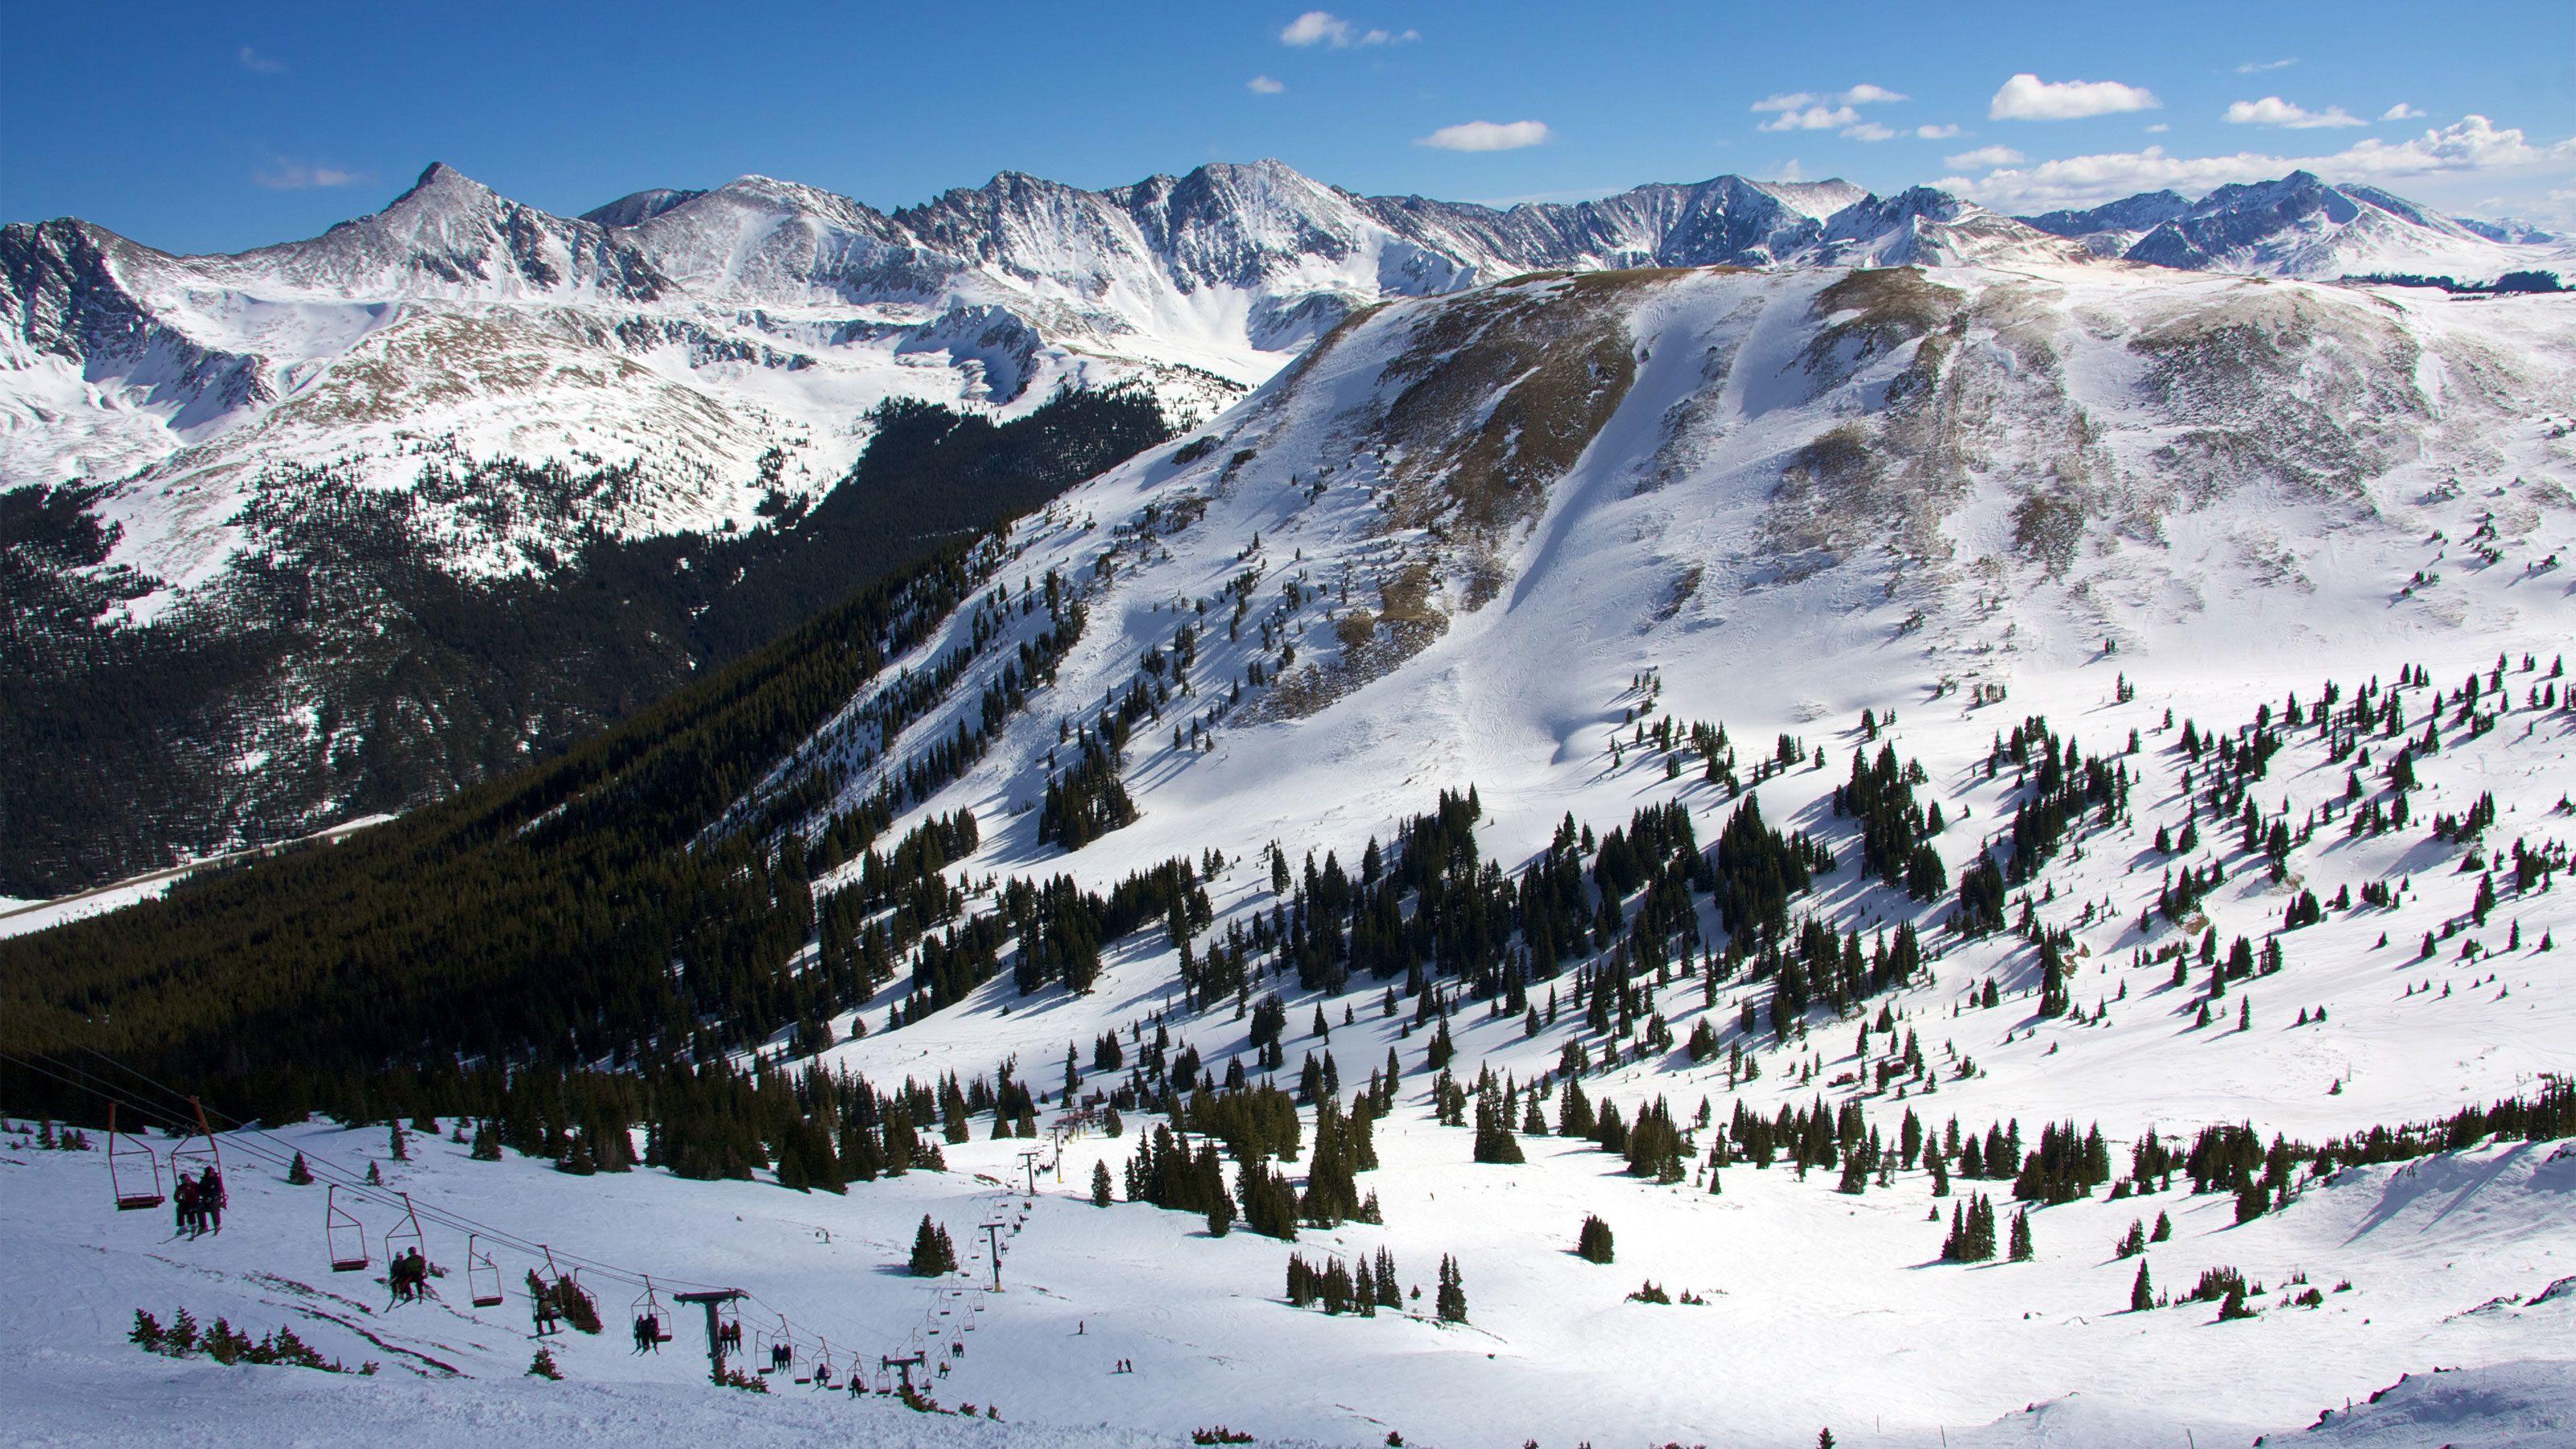 Snowy trails of Breckenridge